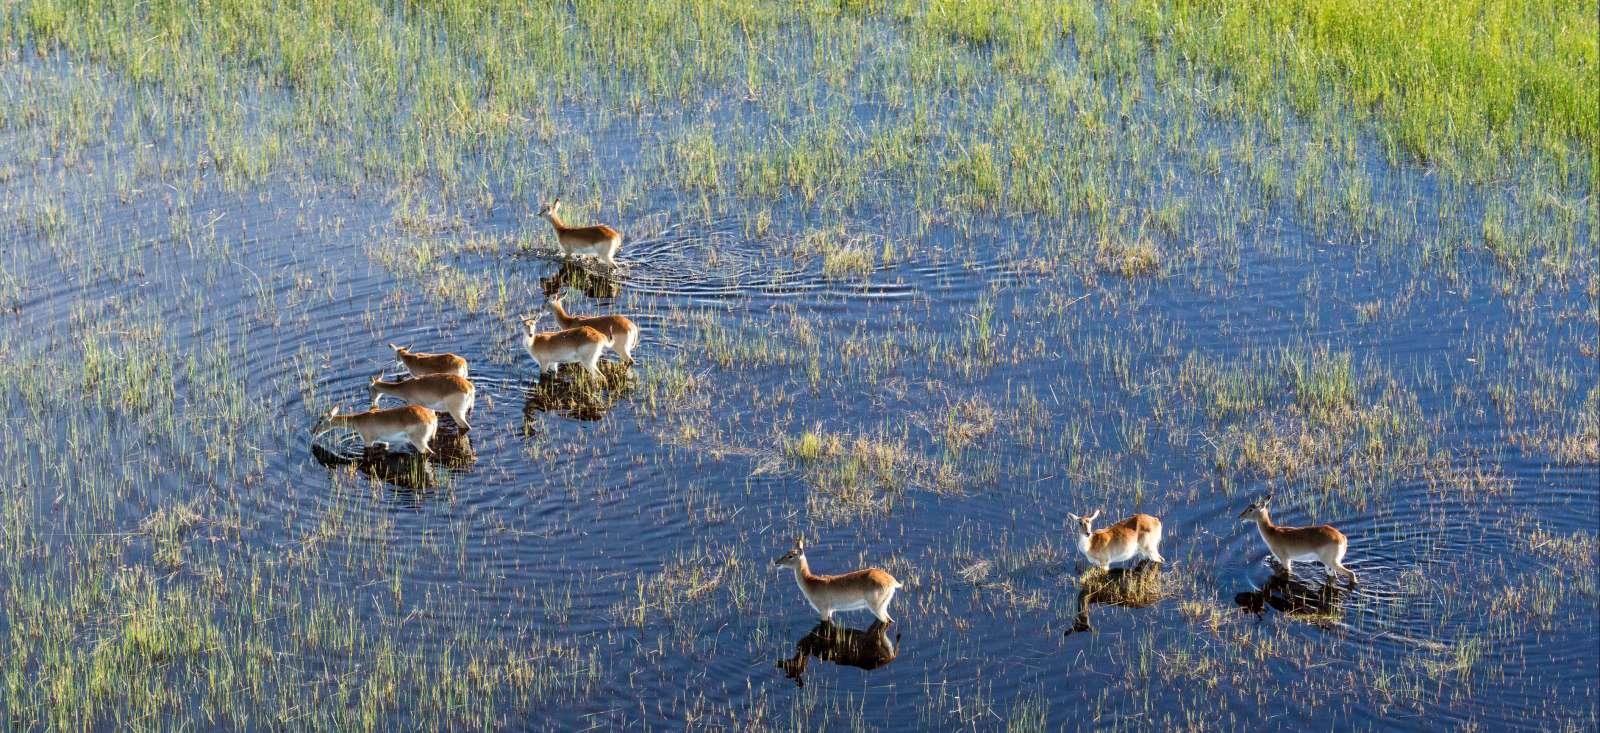 Voyage en véhicule Botswana : Paradis des animaux !